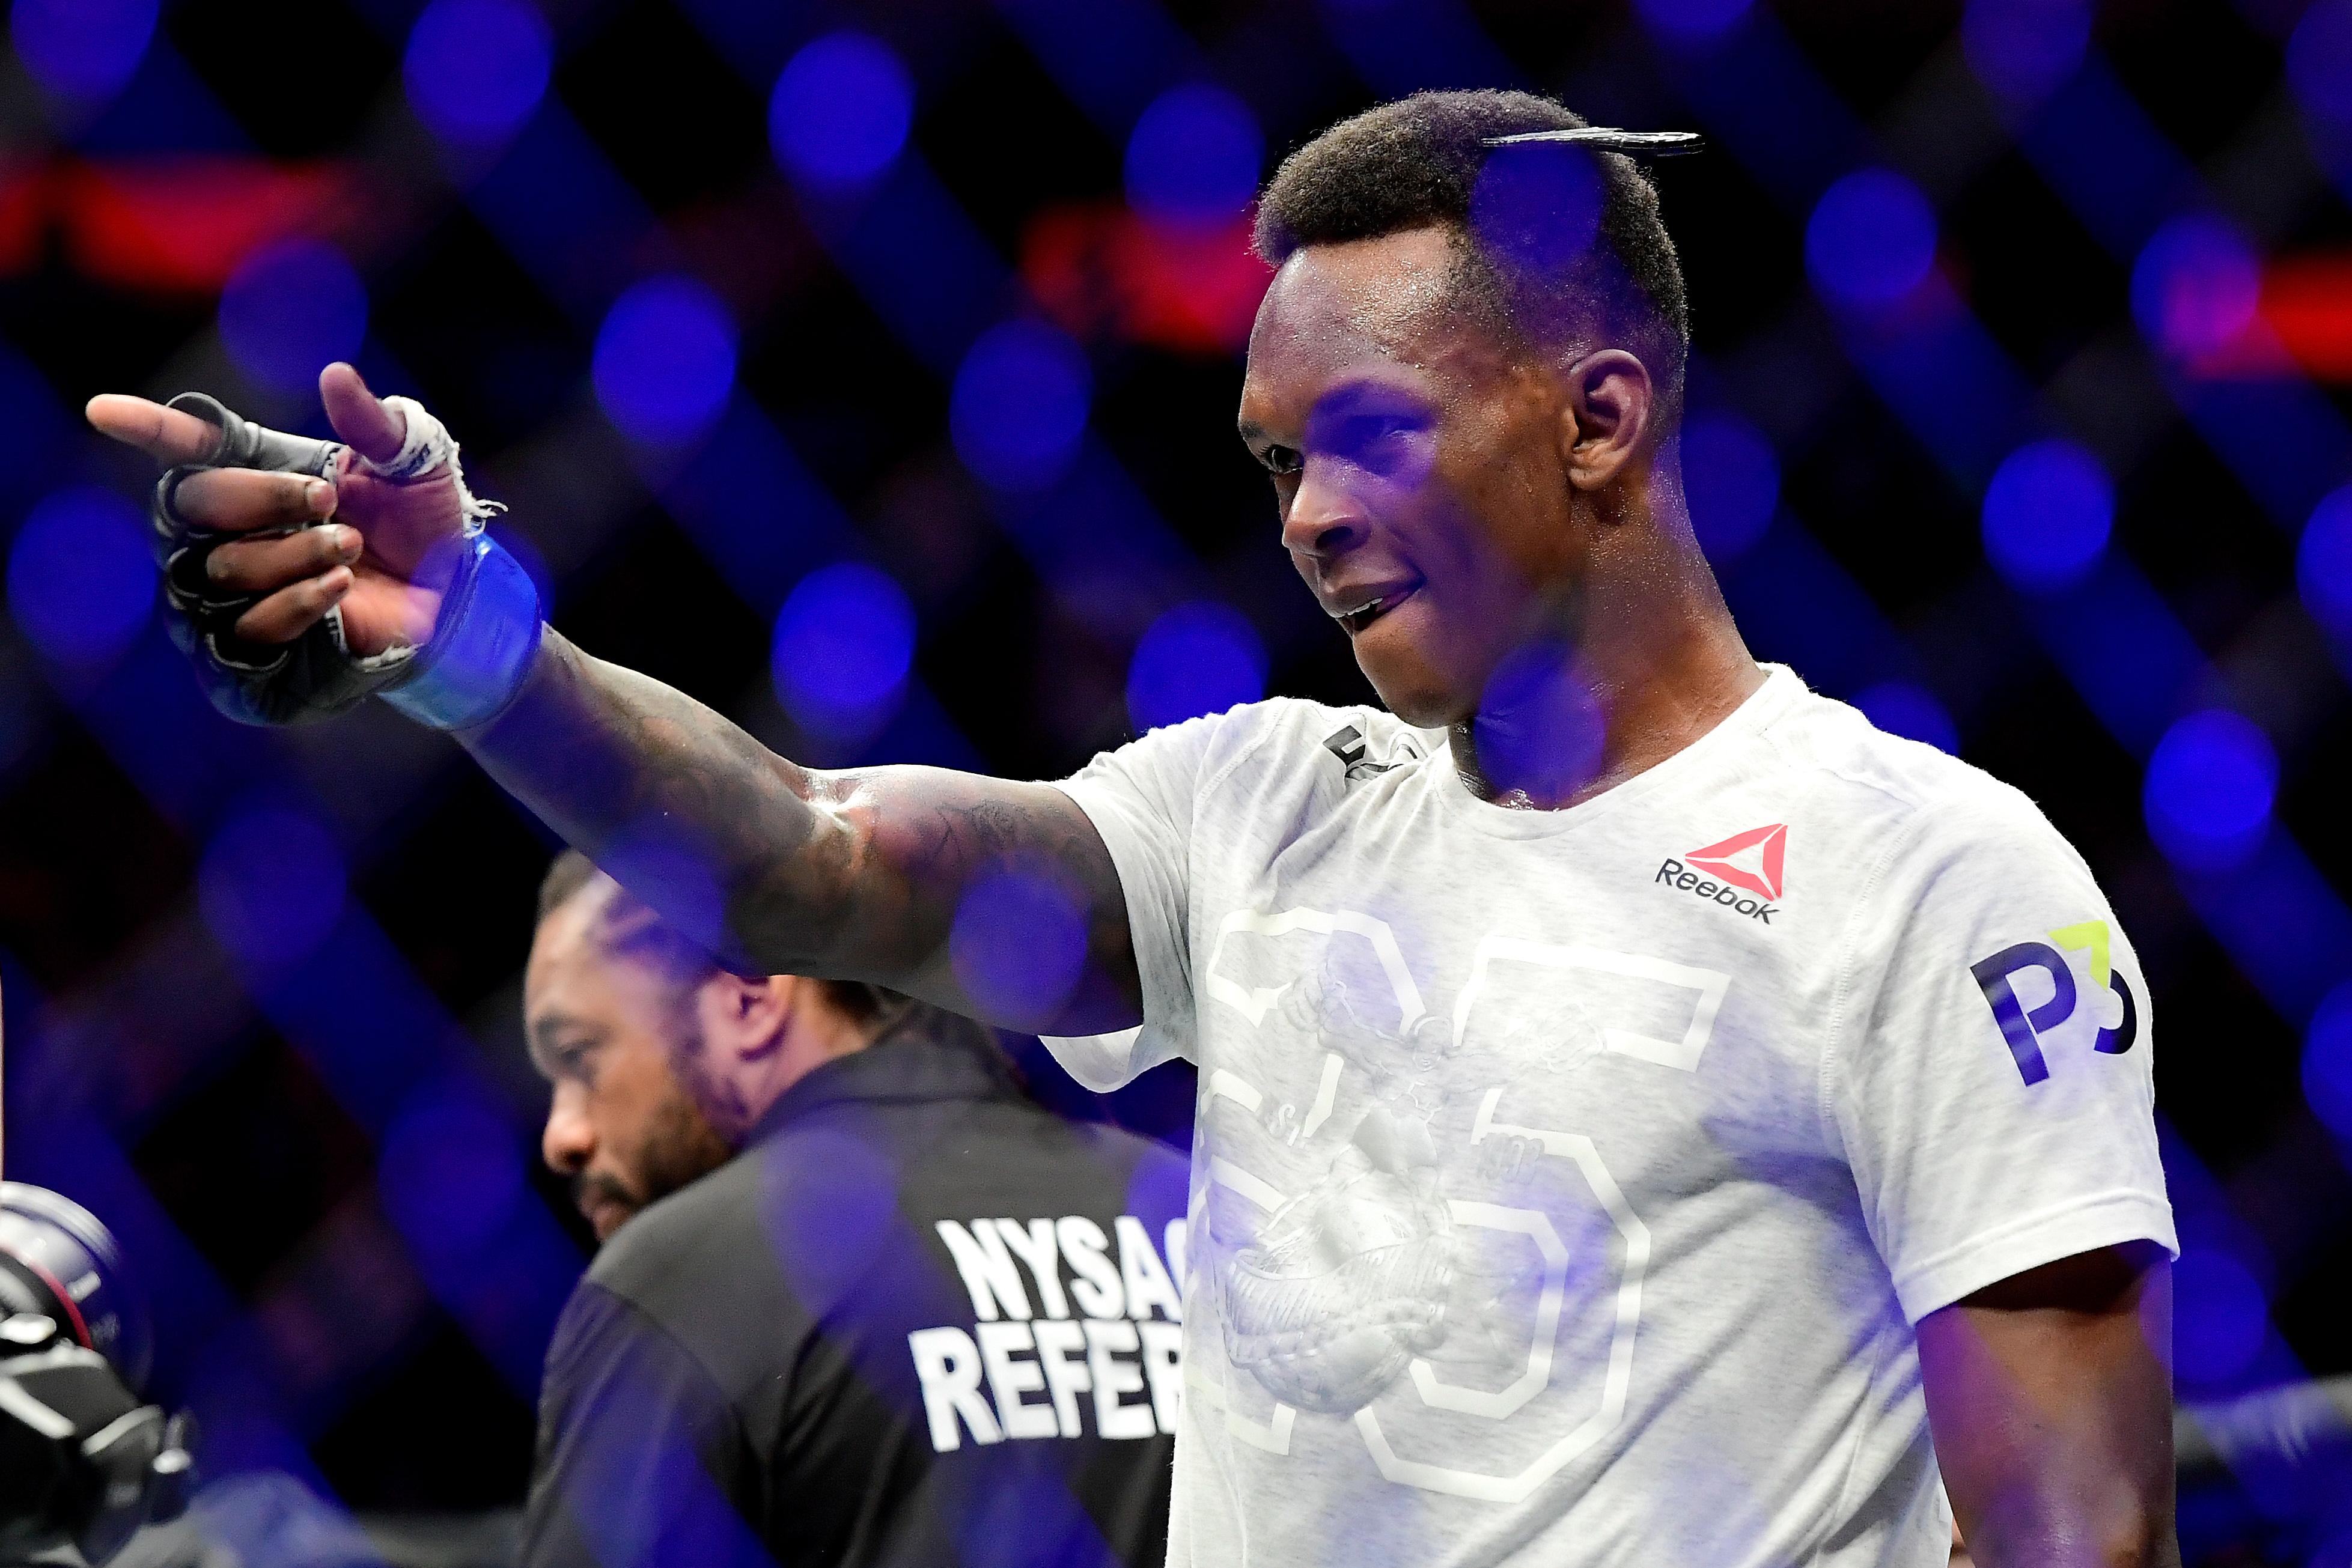 Israel Adesanya edmen shahbazyan UFC 244 Jorge Masvidal Nate Diaz Joe Rogan JRE Experience MMA News Video